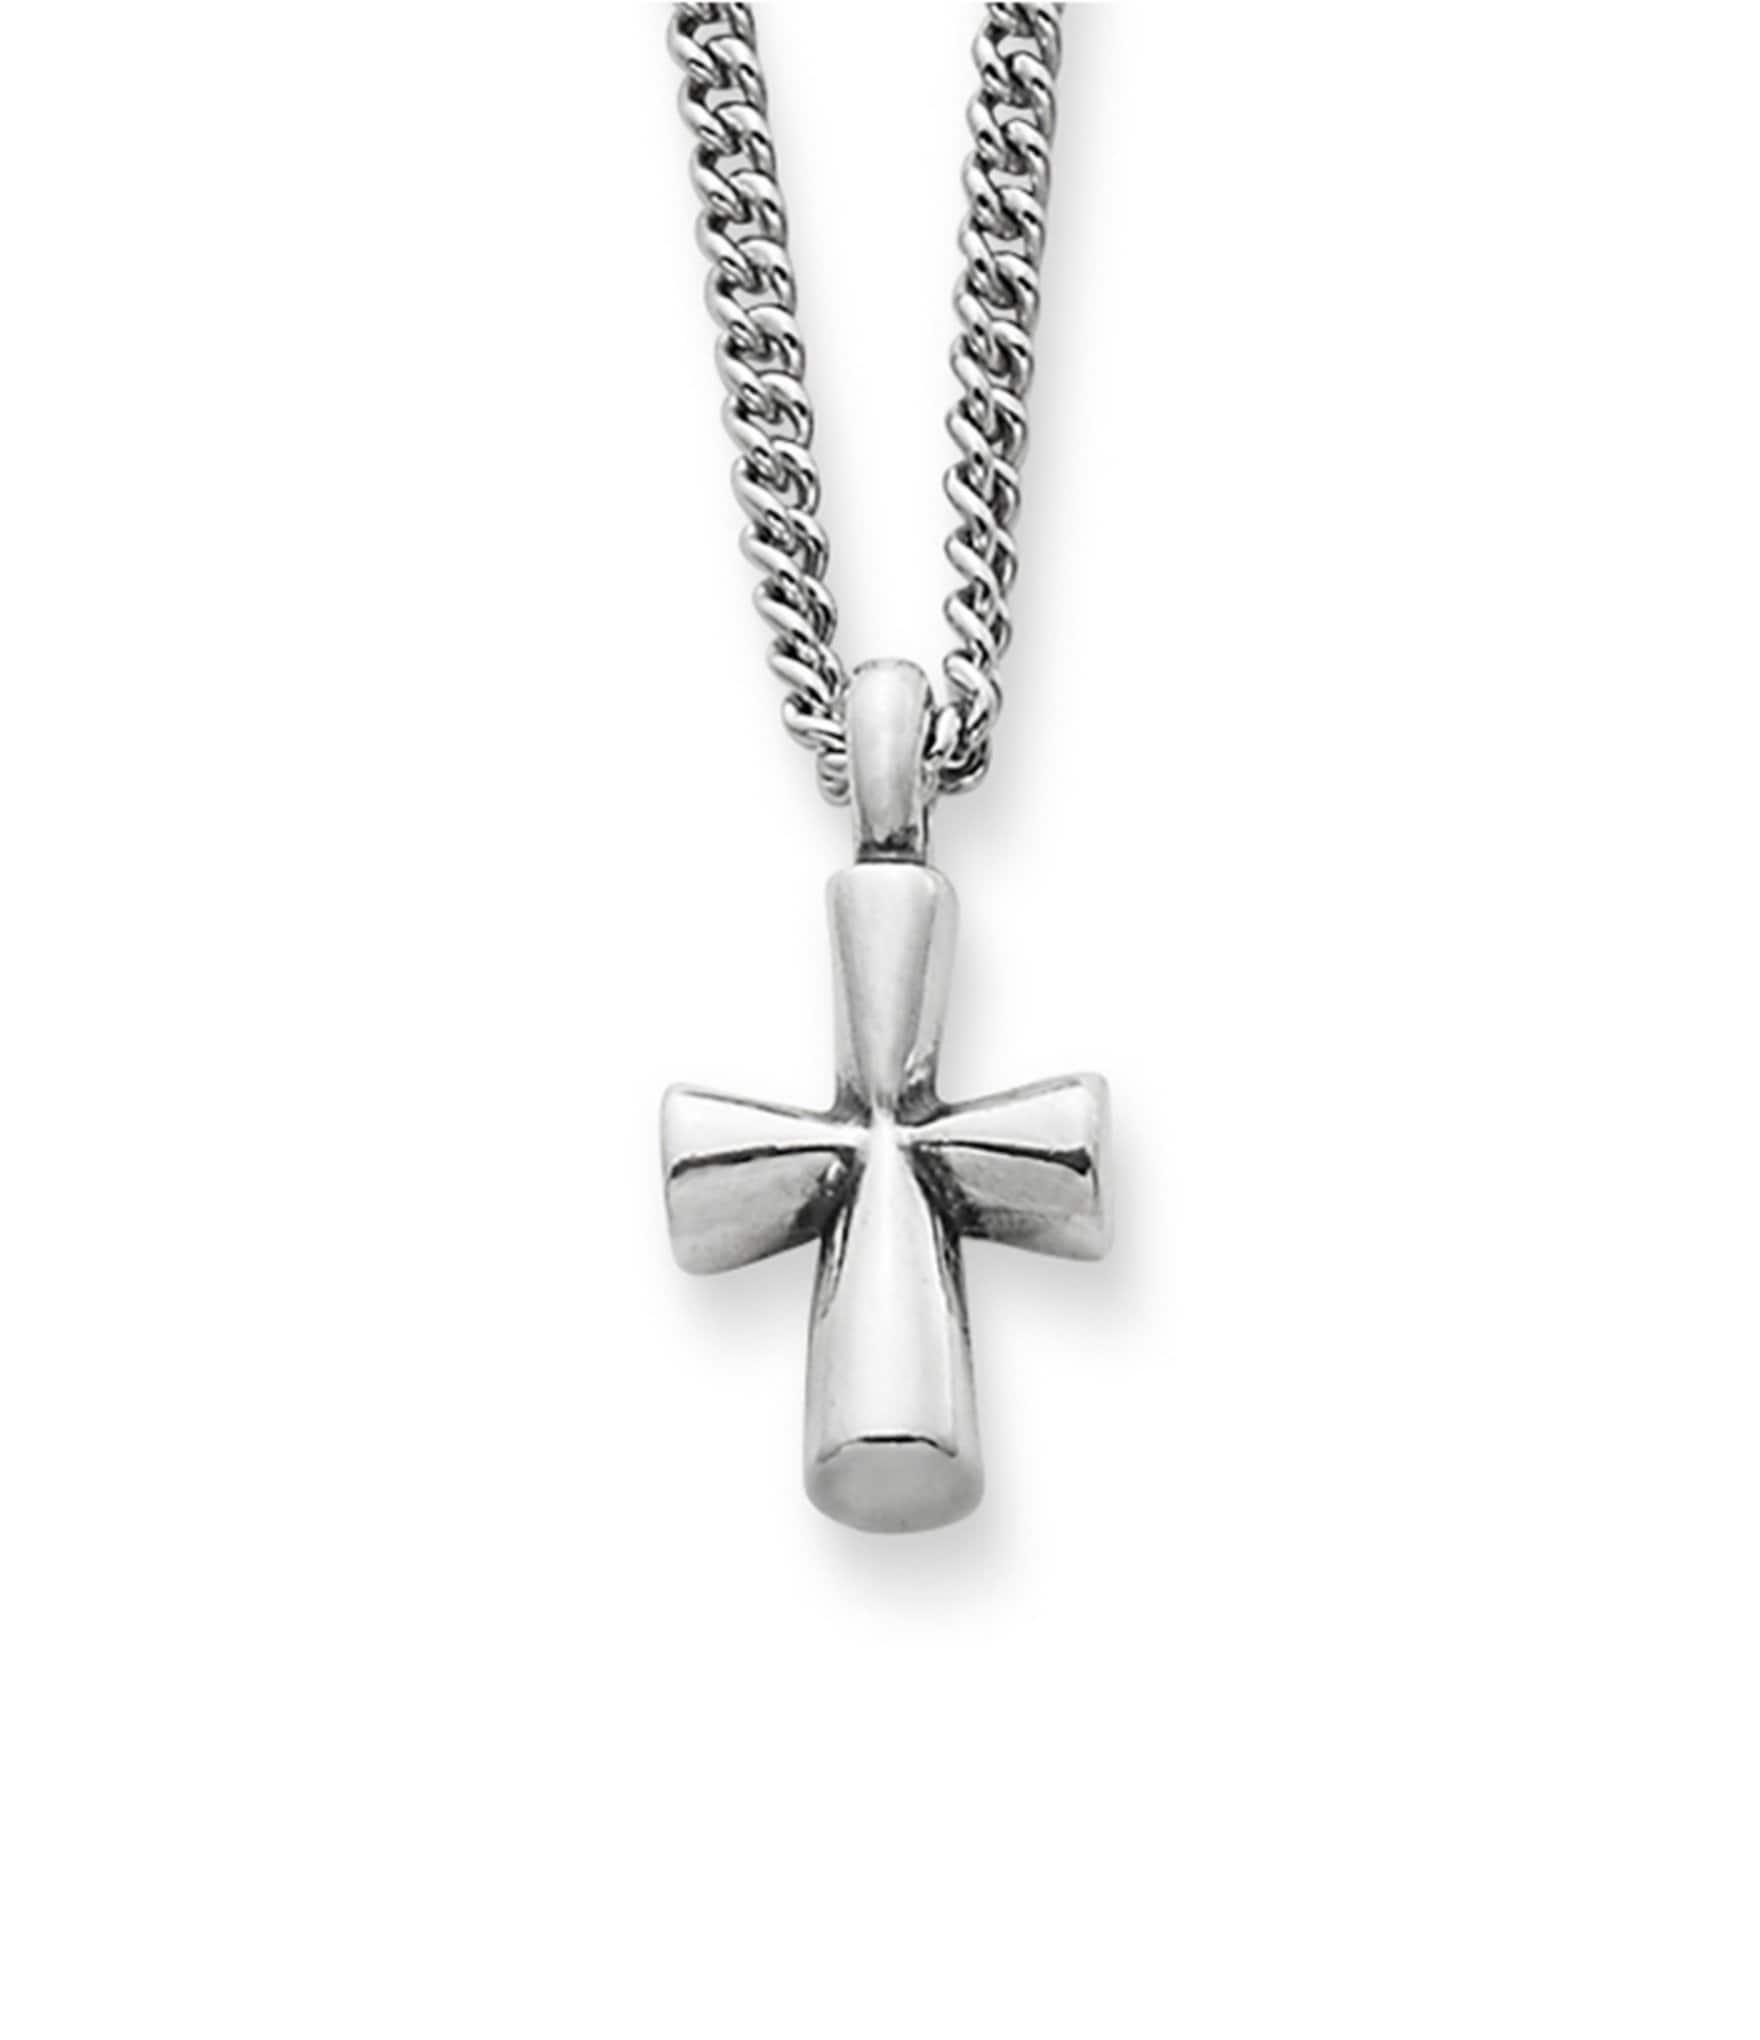 James Avery Mens Cross Necklace: James Avery St Teresa Cross Sterling Silver Pendant